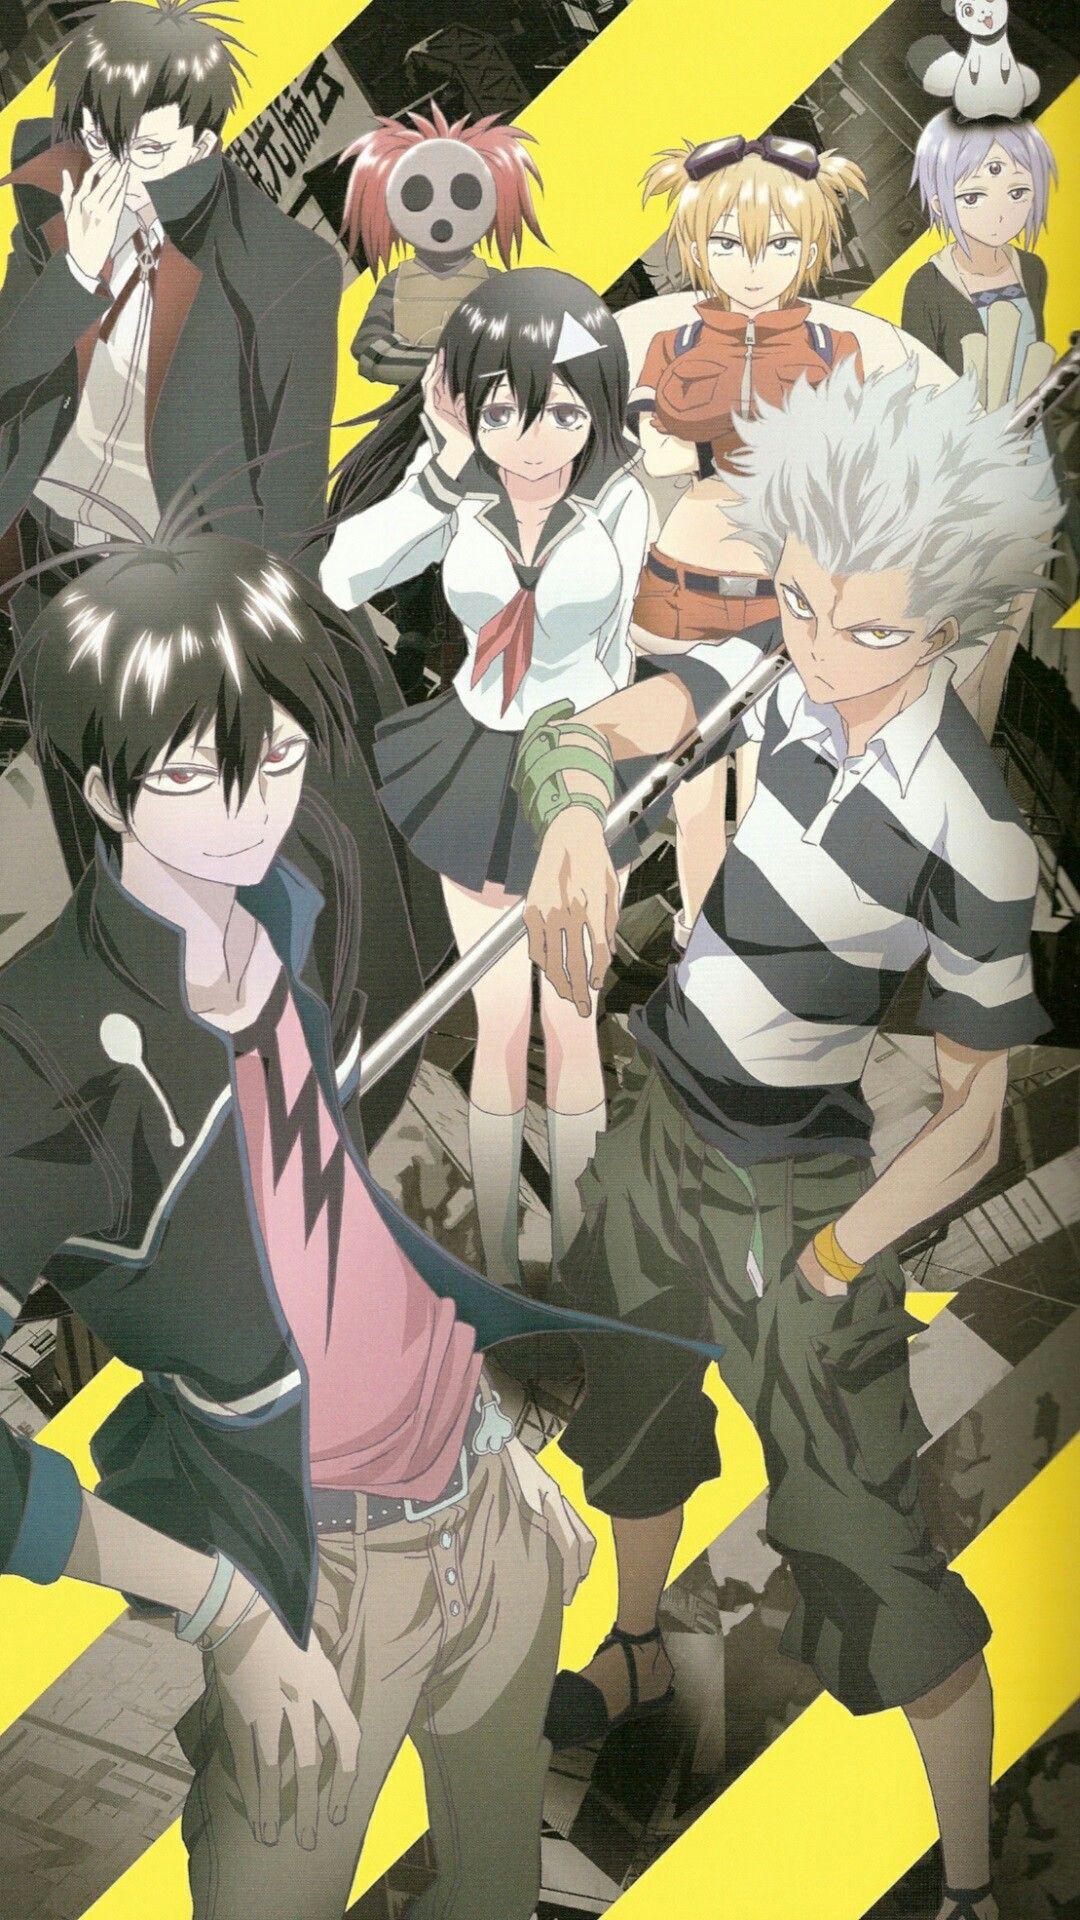 Blood Lad Anime, Anime characters, Anime news network